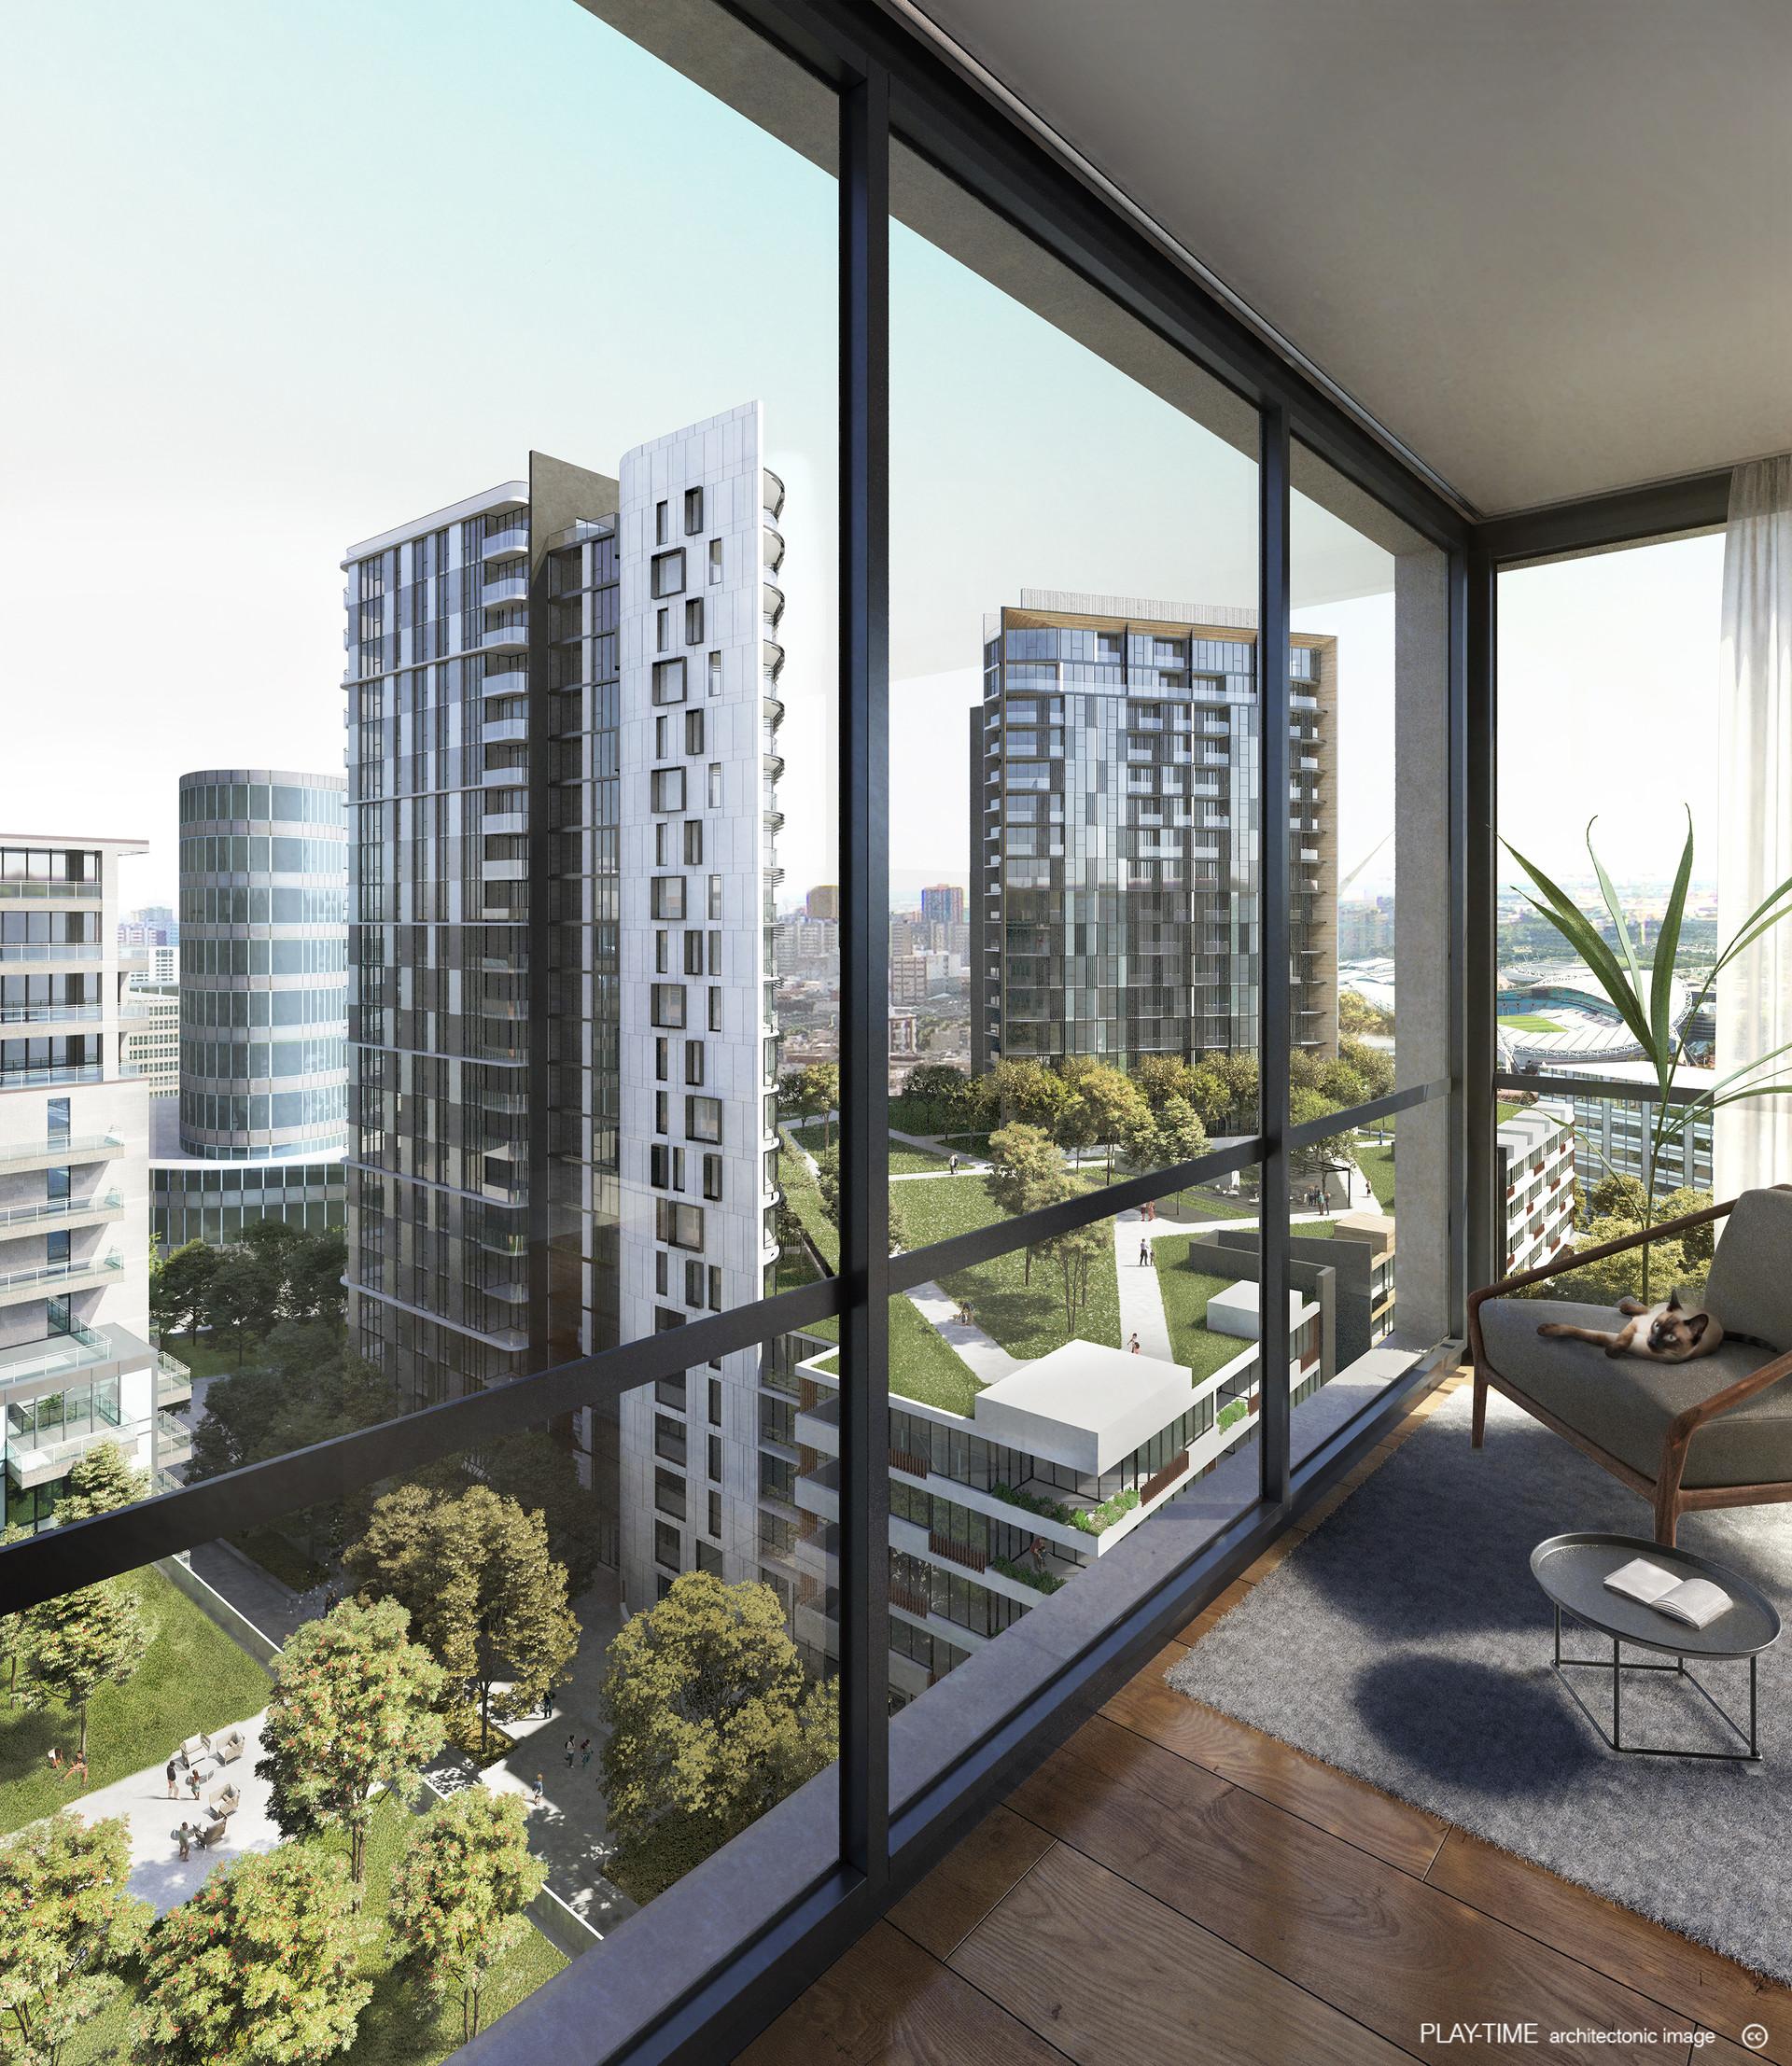 Play time architectonic image chrone architects masterplaning residential sydney olympic park nsw q